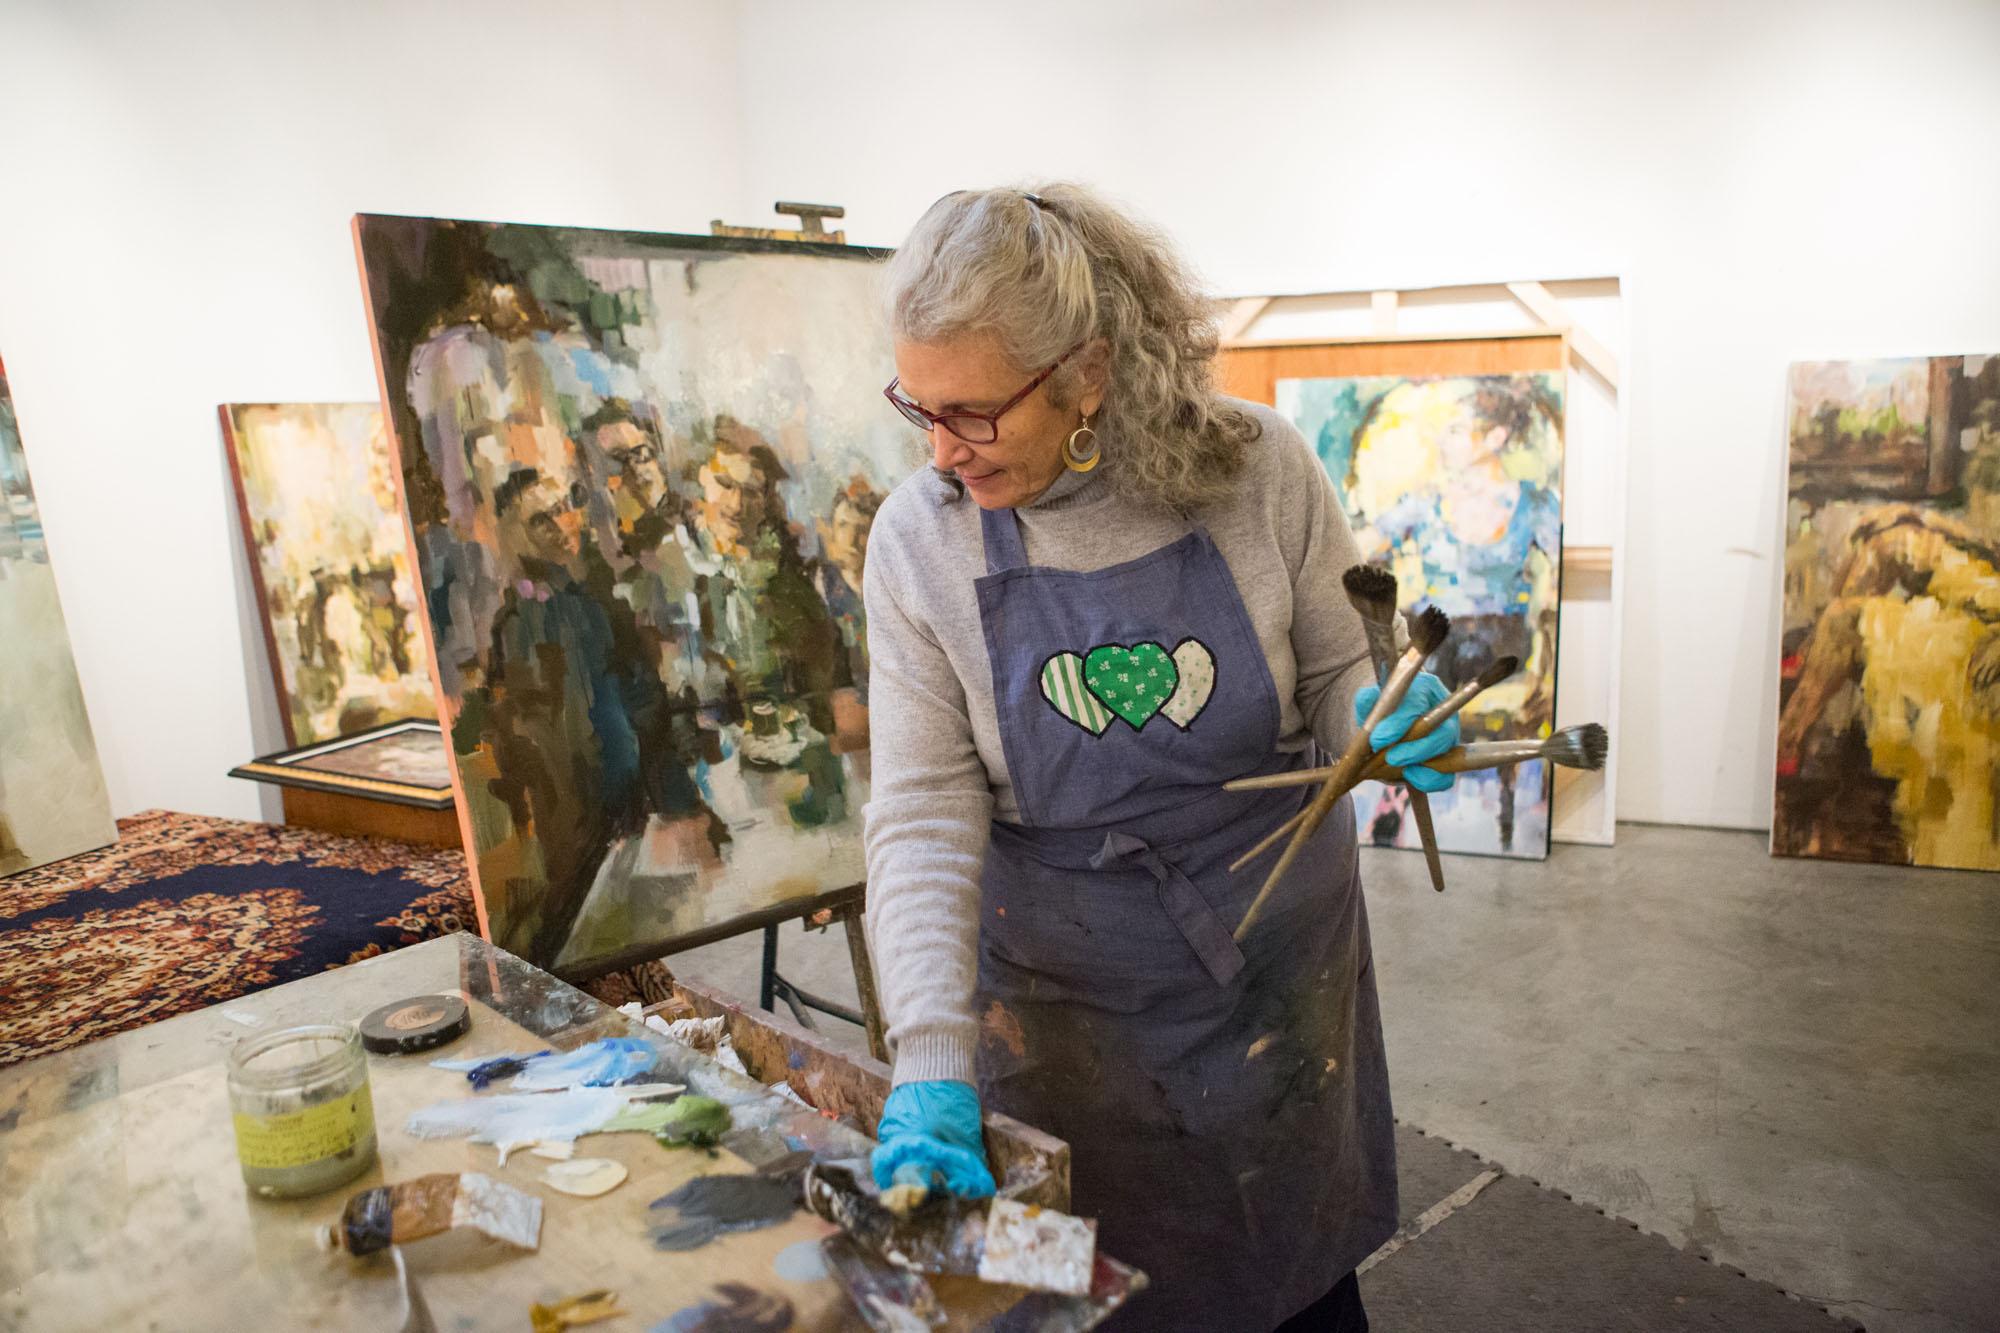 Michele-guilvazan-artist-studio-branding-photos-oil-painter102.jpg